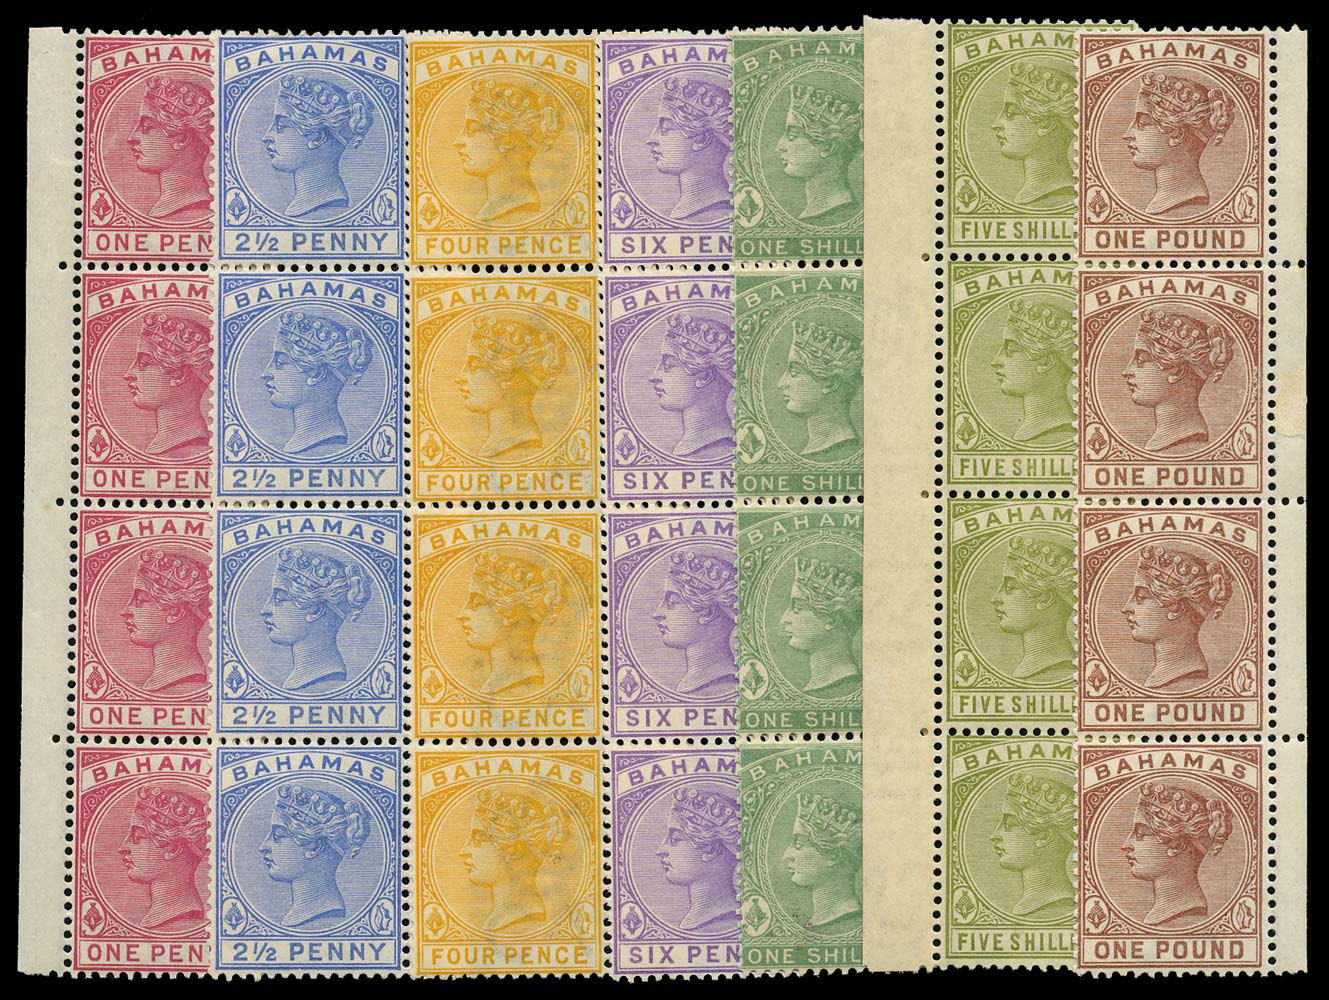 BAHAMAS 1884  SG44, 49/57 Mint